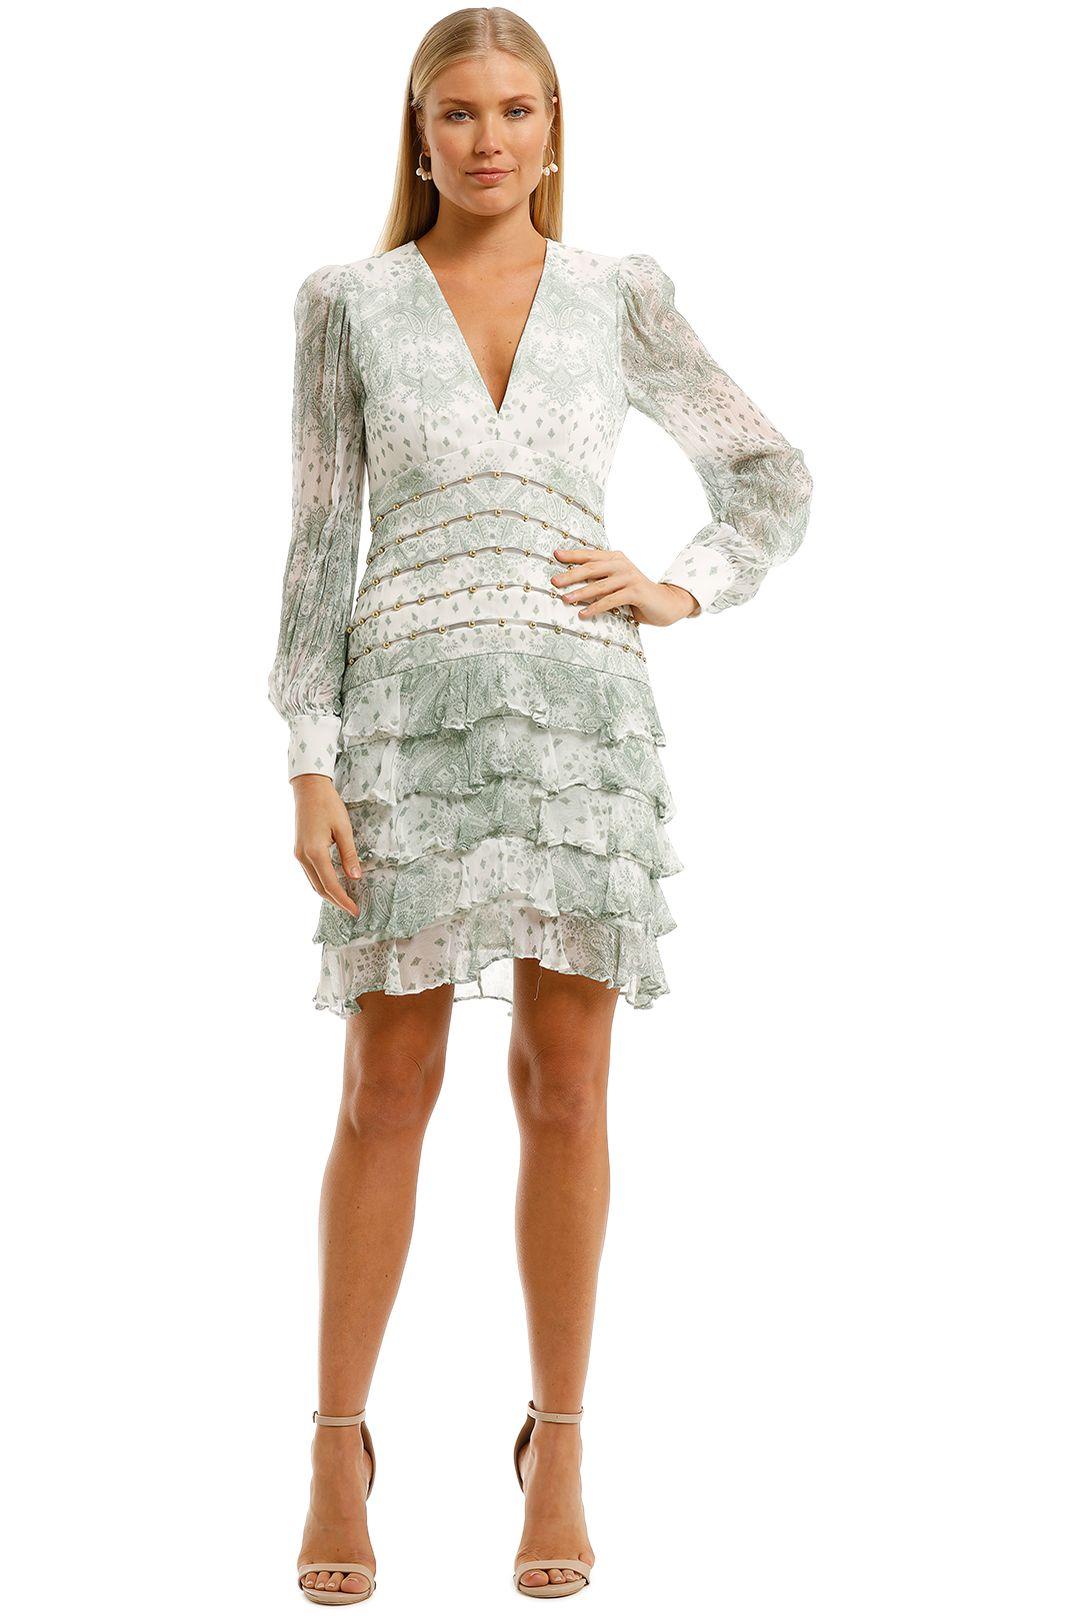 Thurley-Hali-Dress-Ivory-Aqua-Paisley-Front